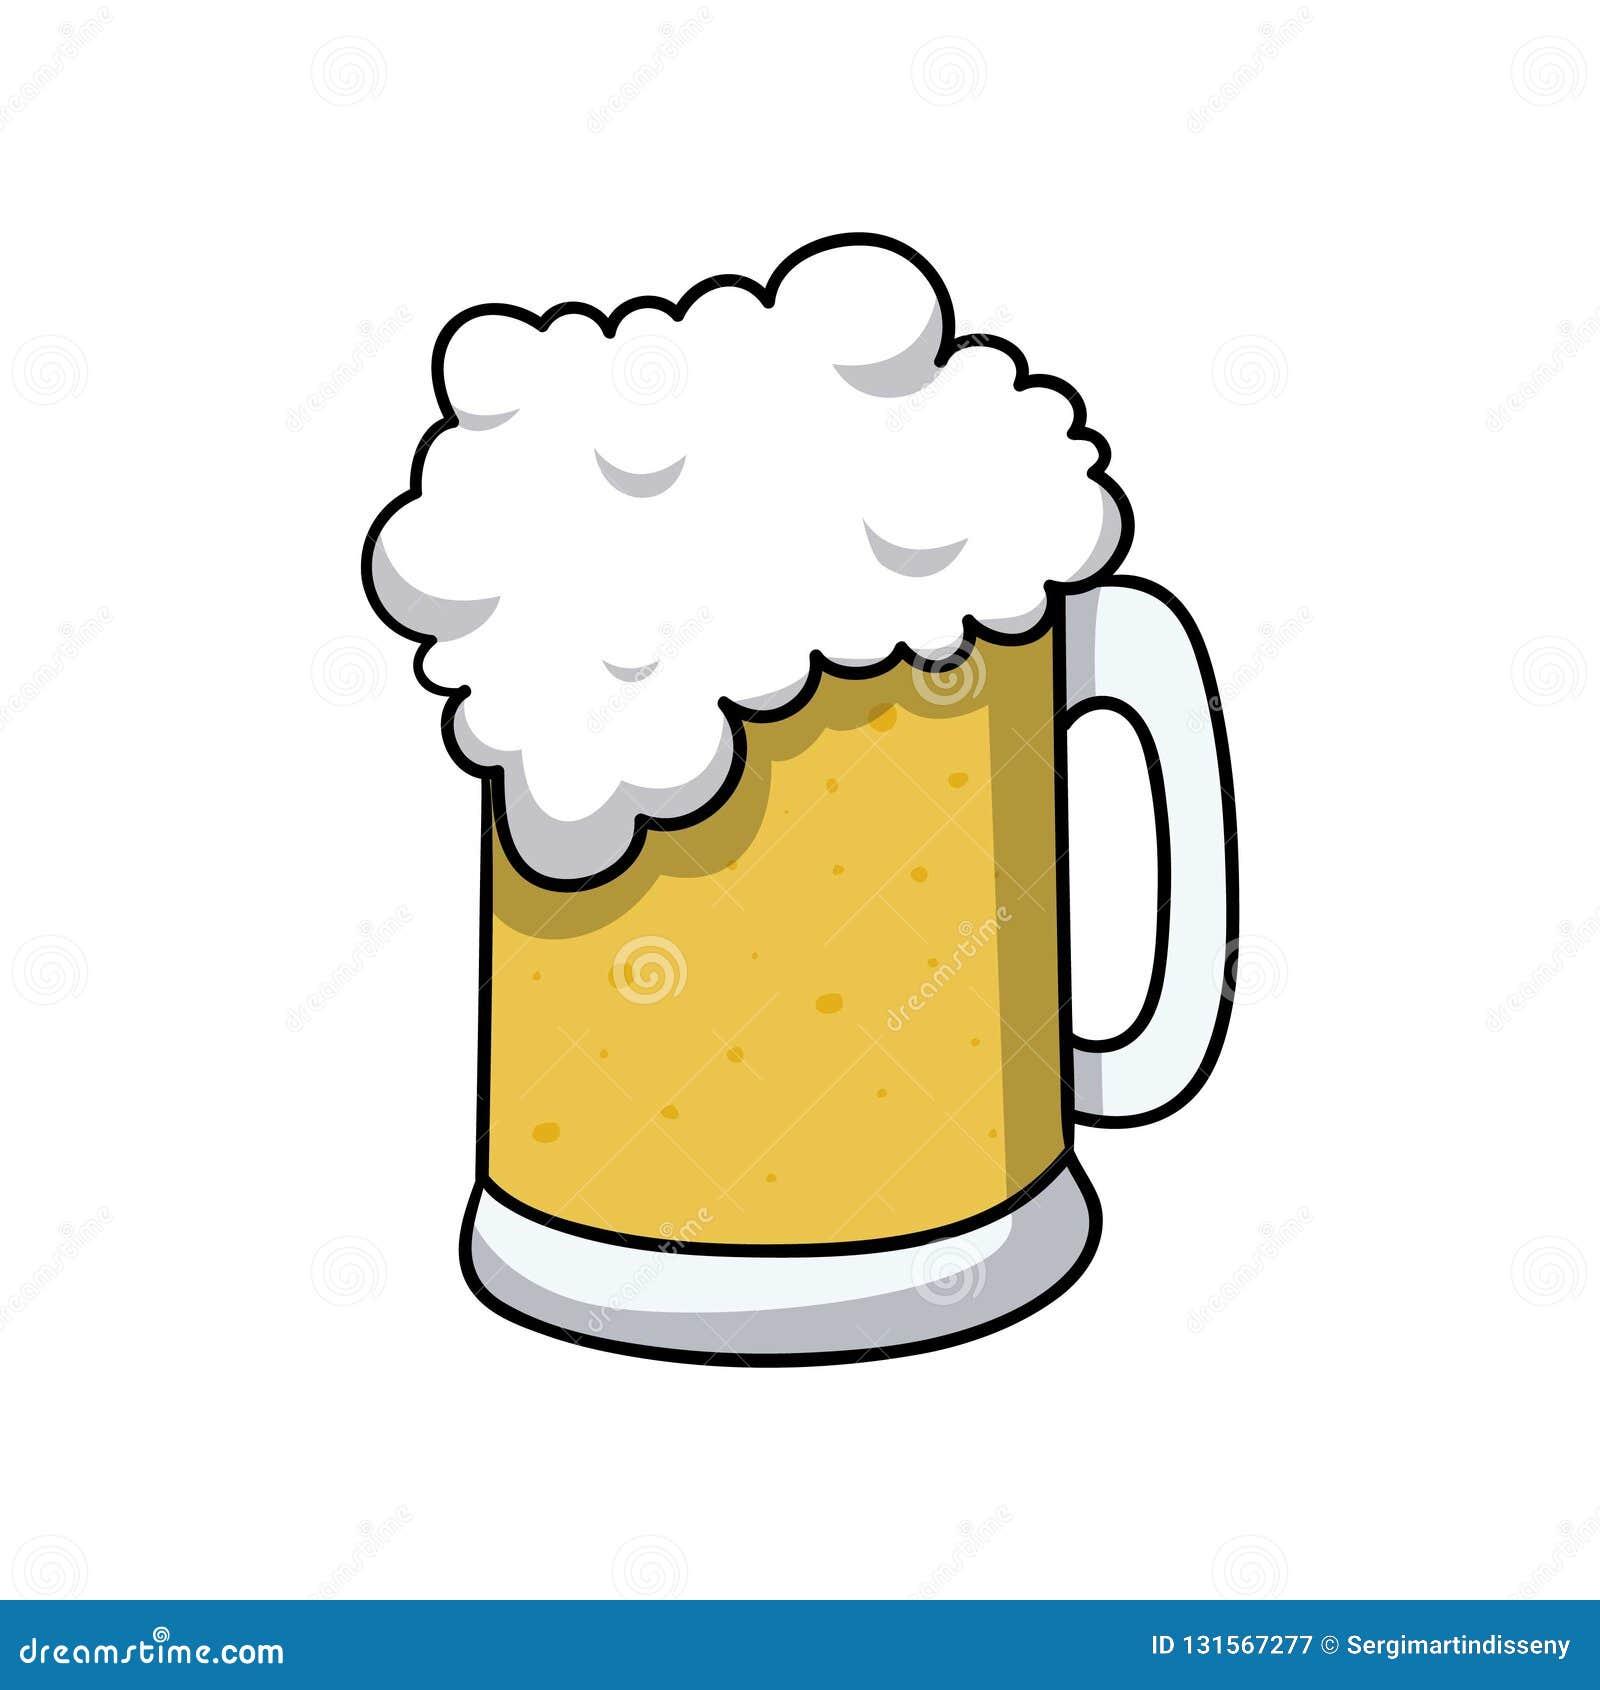 Beer Mug Drink Icon Doodle Cartoon Vector Illustration Stock Vector Illustration Of Light Clip 131567277